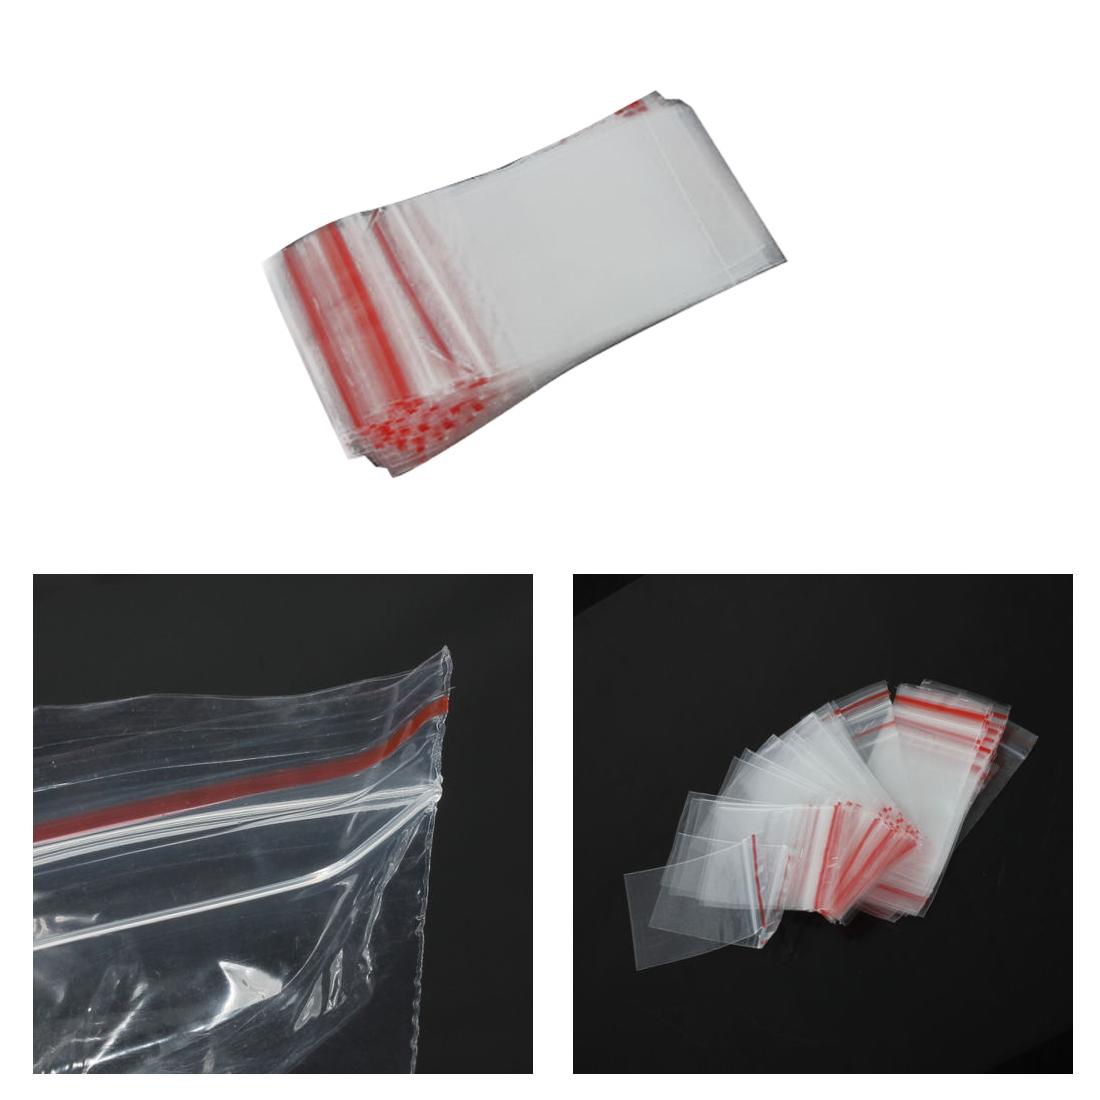 500pcs clear grip self press seal resealable zip lock plastic jewelry bags i1m0 ebay. Black Bedroom Furniture Sets. Home Design Ideas